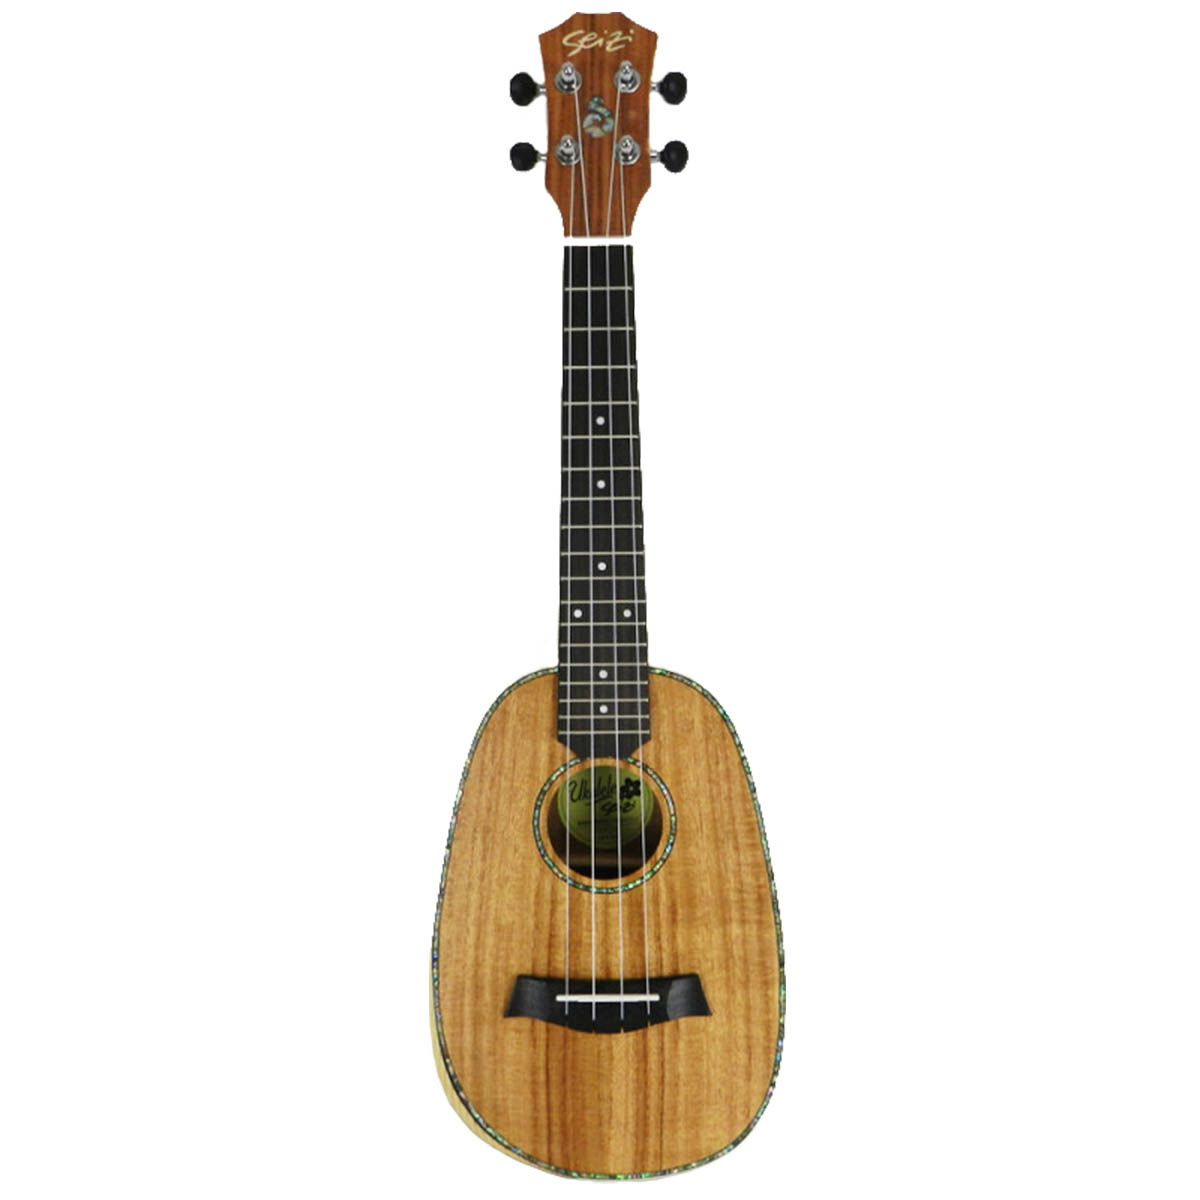 Ukulele Acústico Seizi Bora-Bora Pineapple Concert Koa